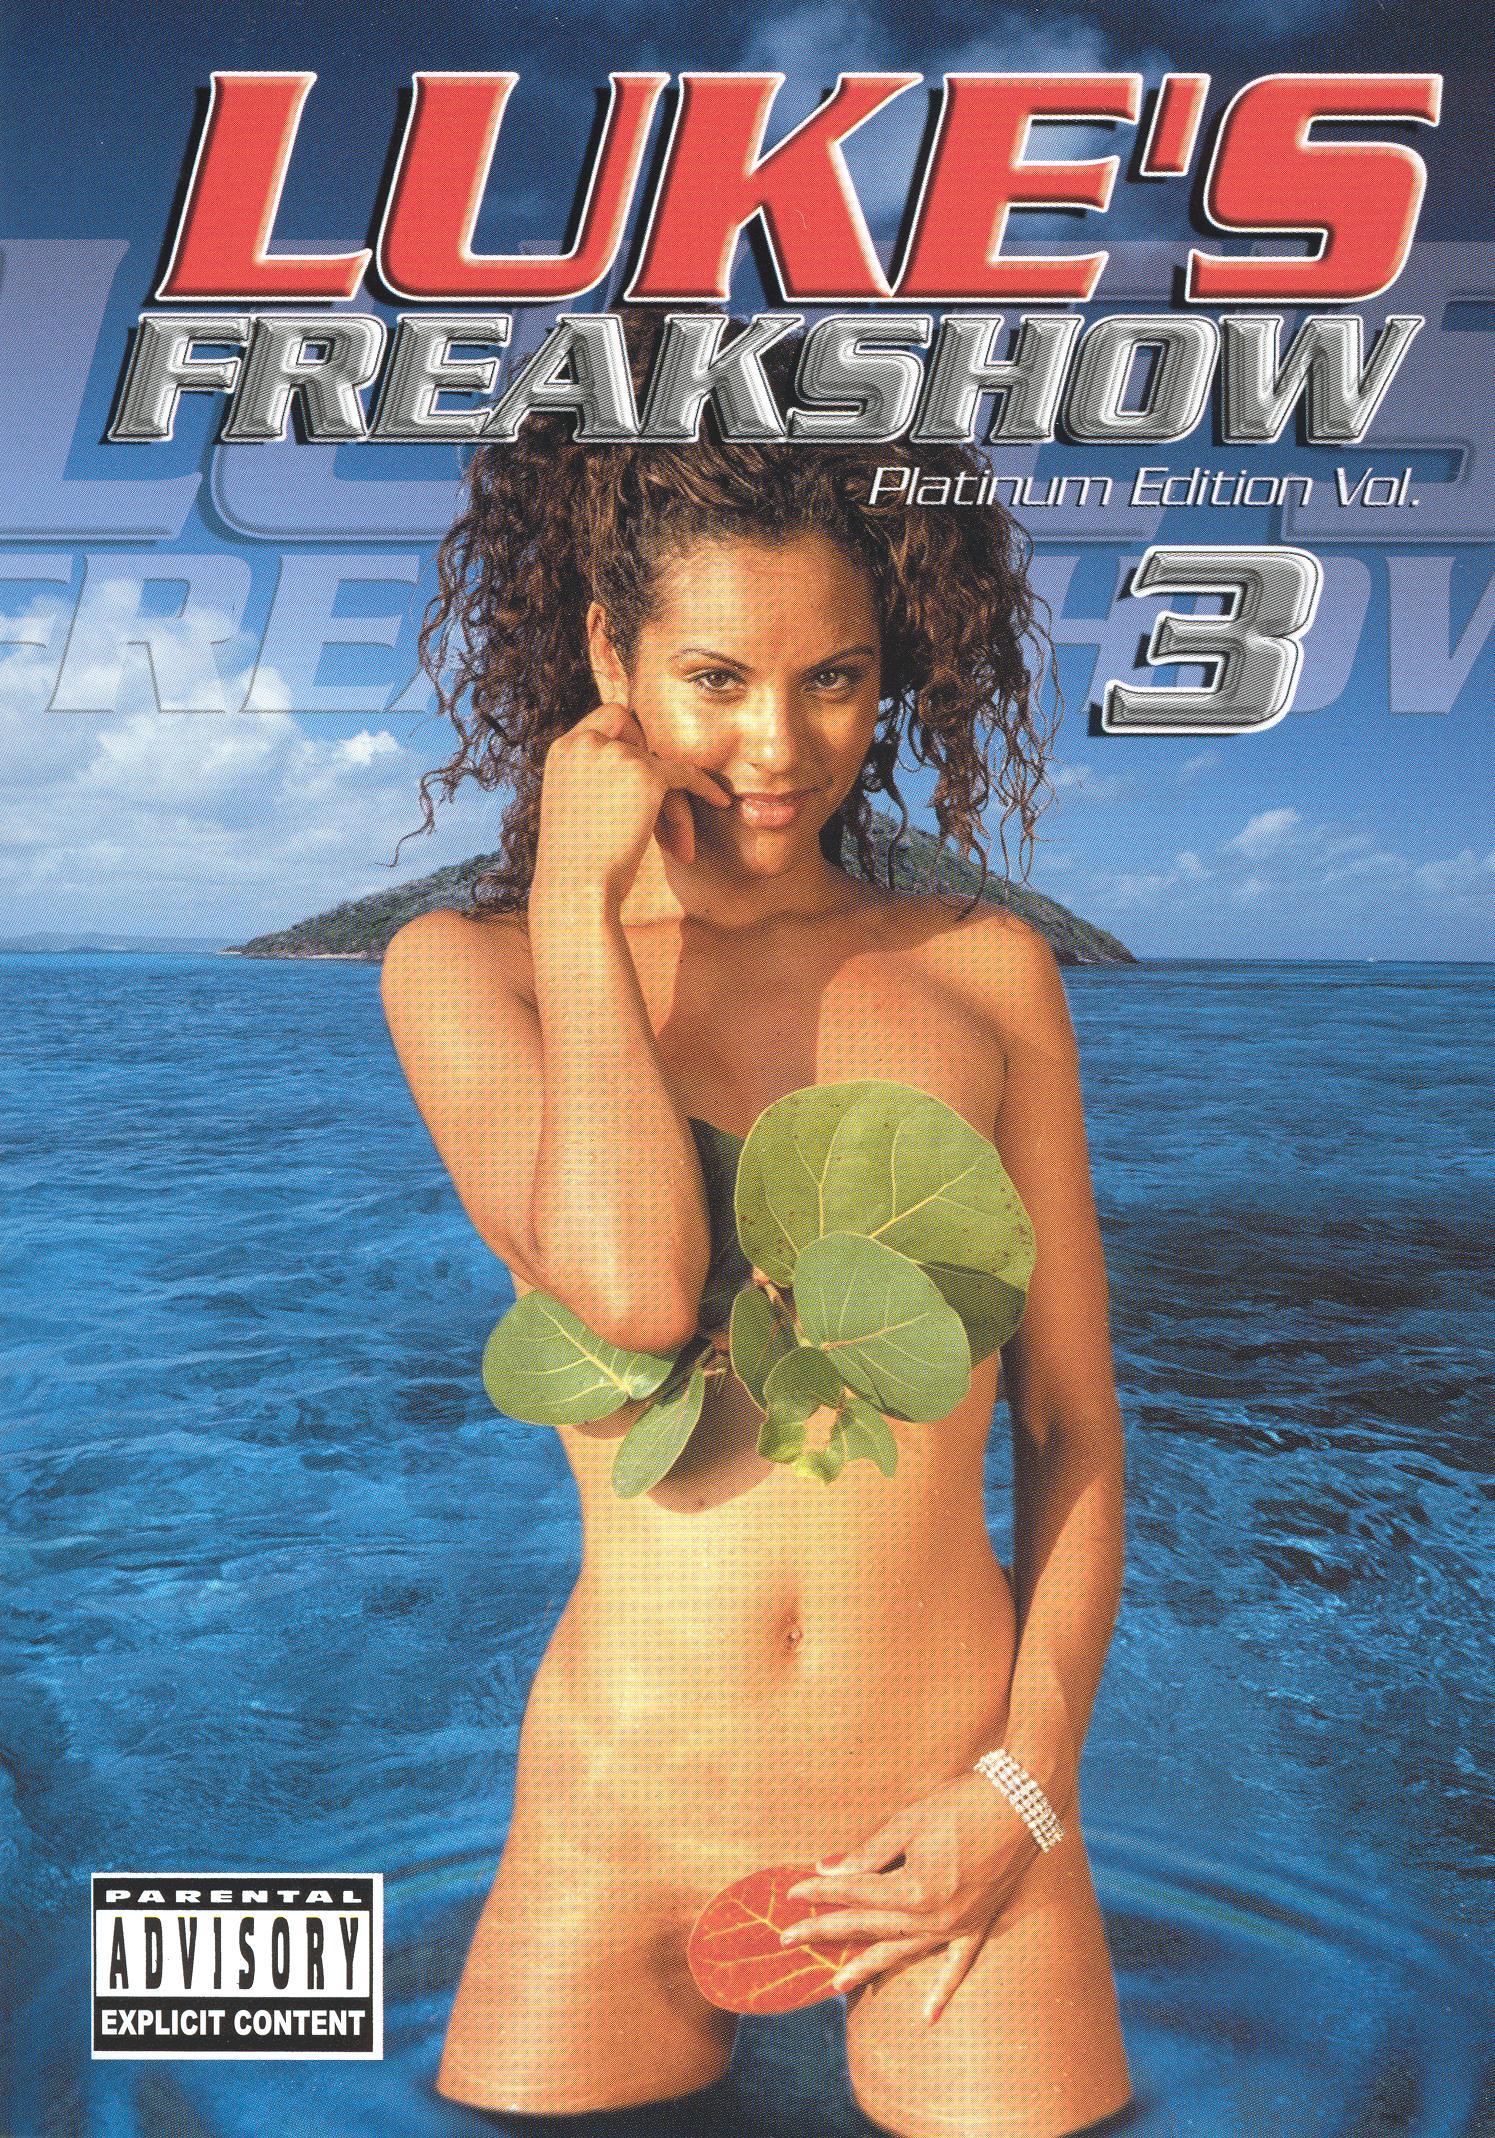 Luke's Freakshow: Platinum Edition, Vol. 3